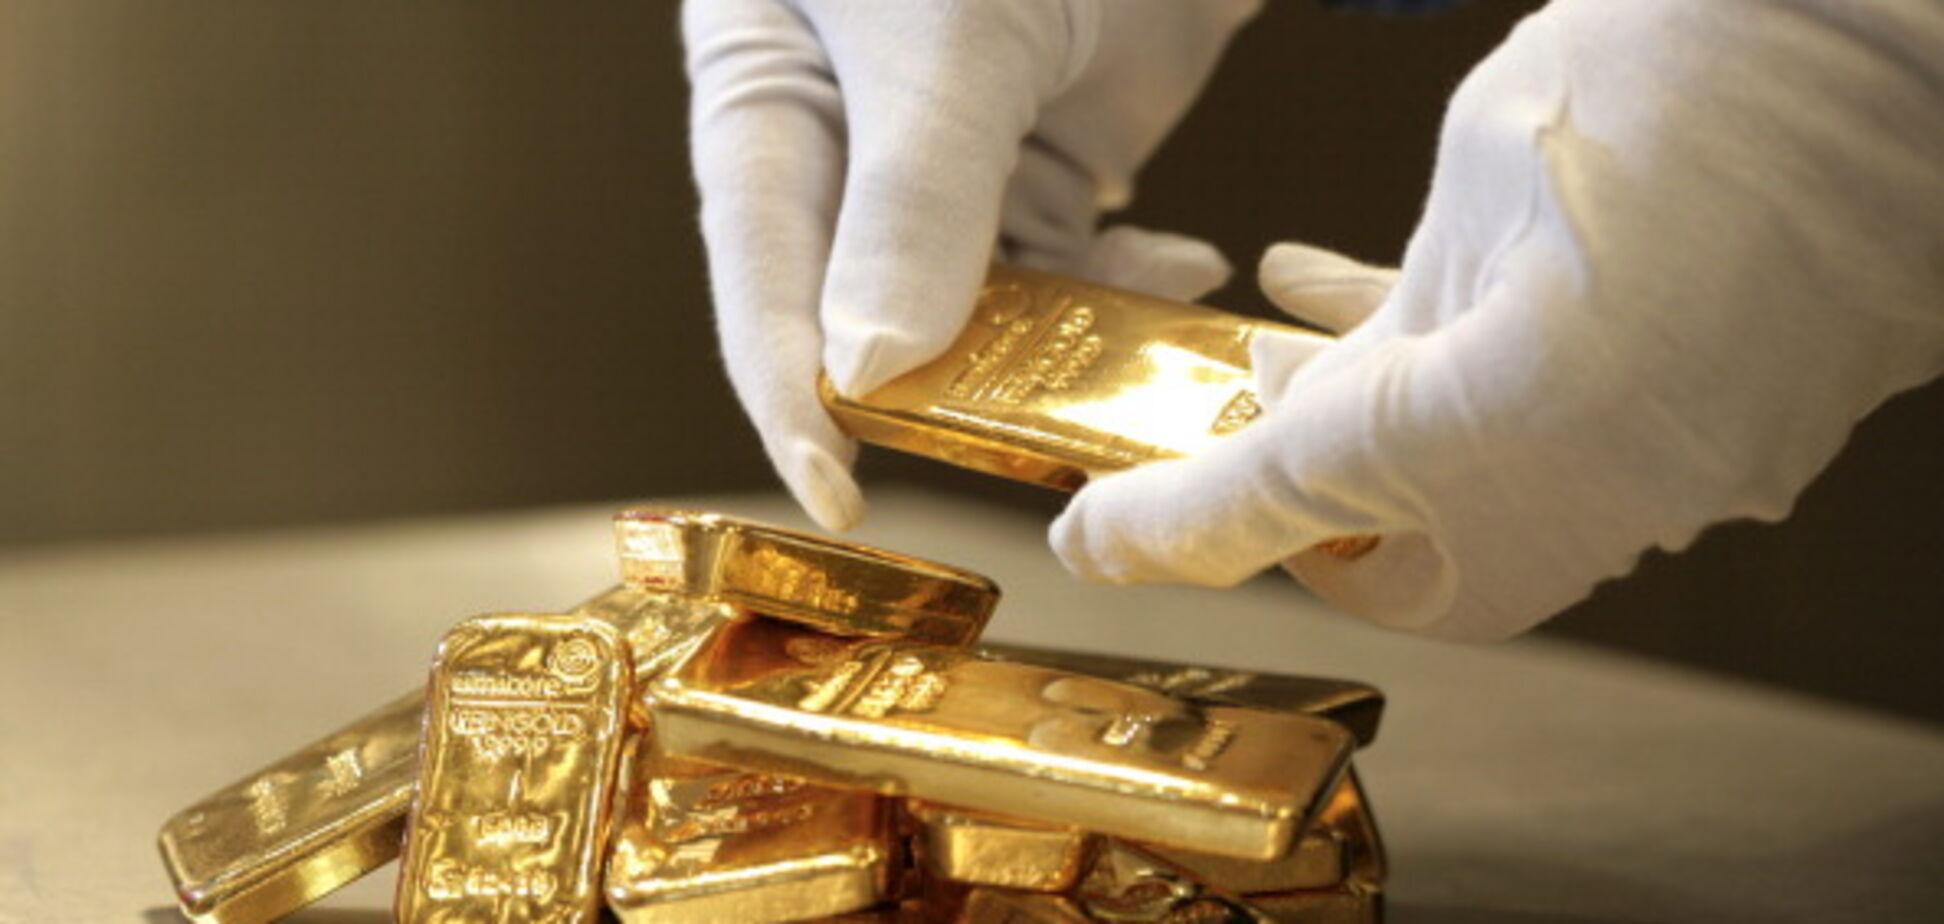 'Мягкое, коричневое и неприятно пахнет': в 'ЛНР' обнаружили золото